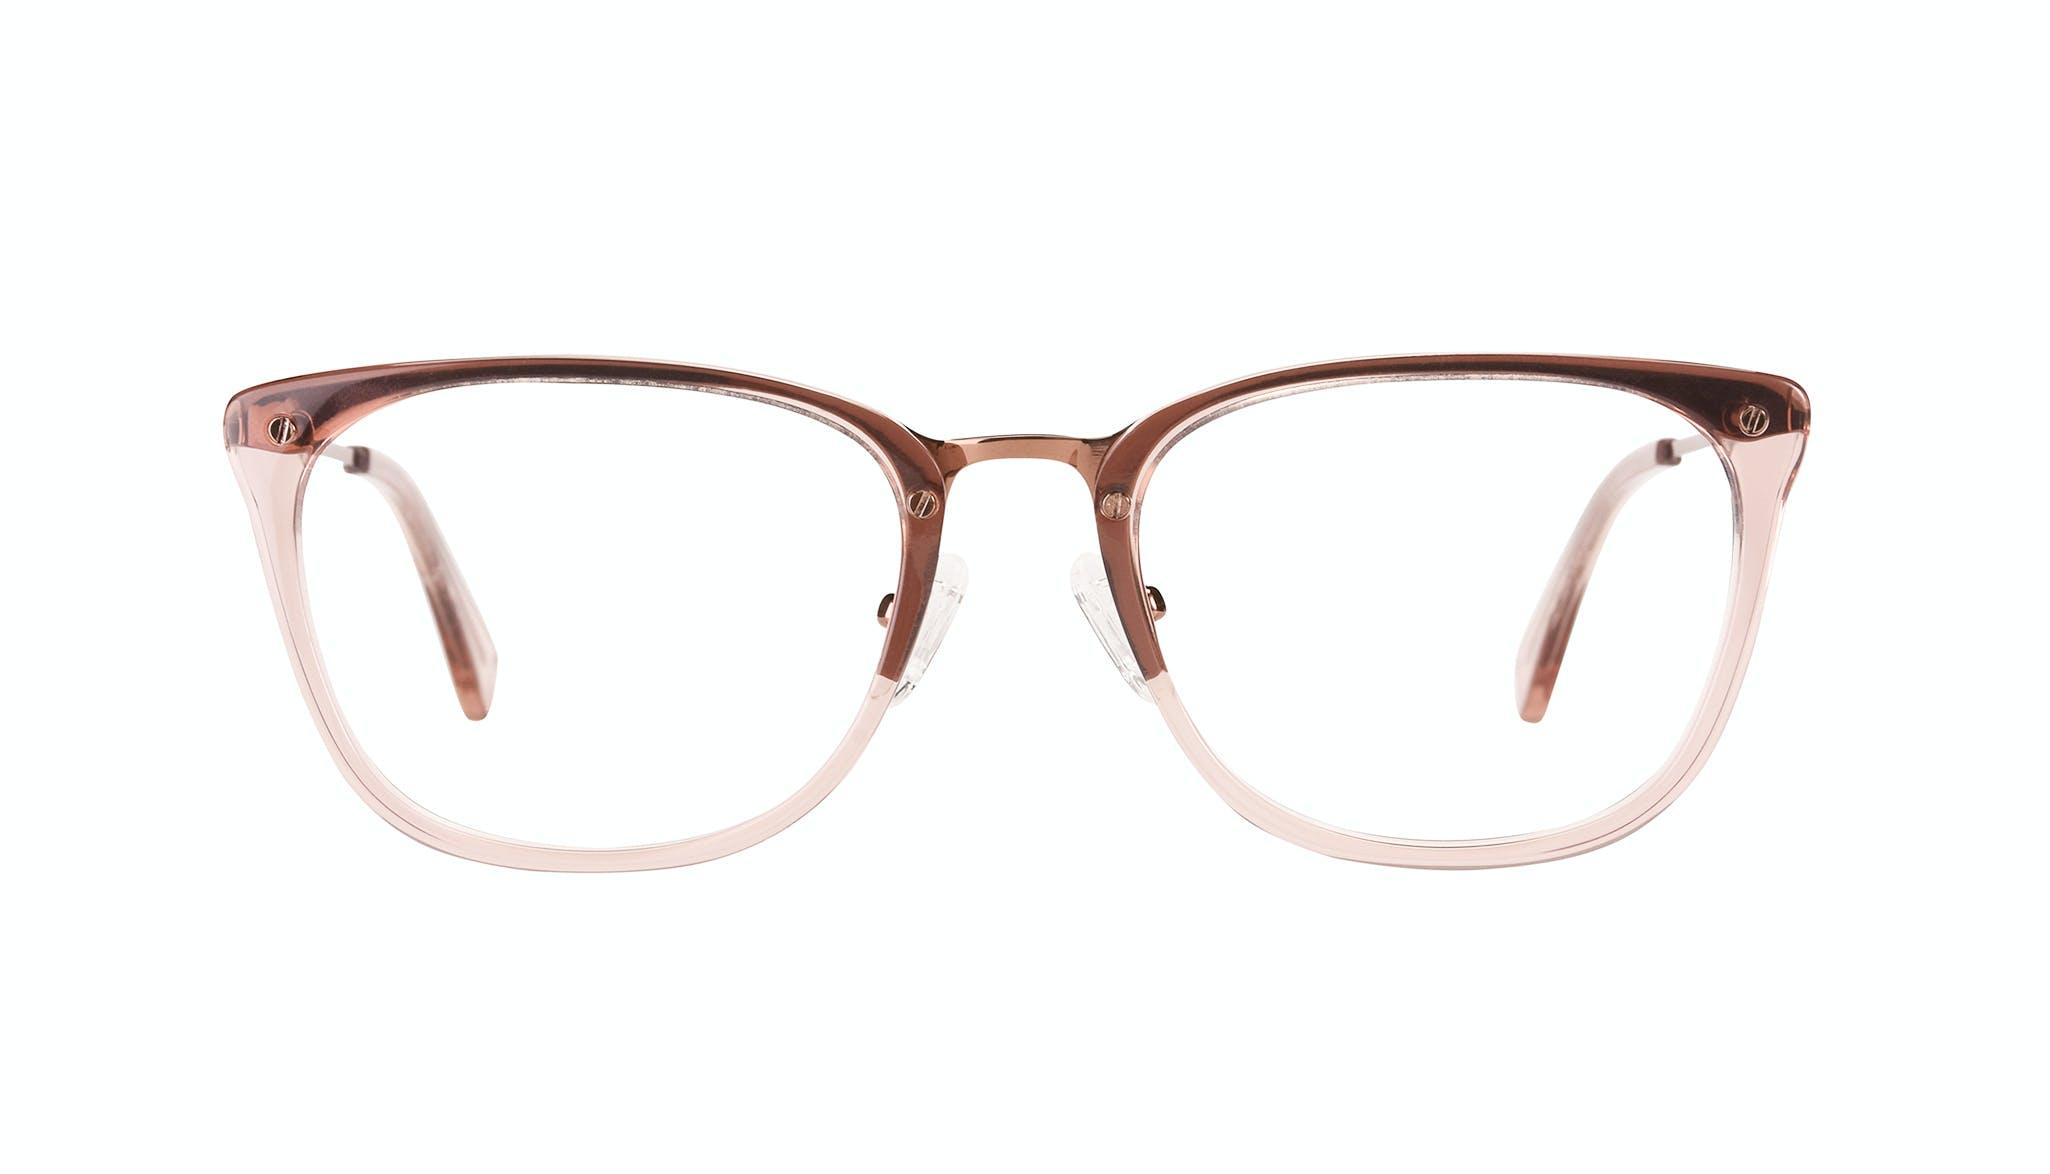 Affordable Fashion Glasses Rectangle Eyeglasses Women Wonder Rose Front